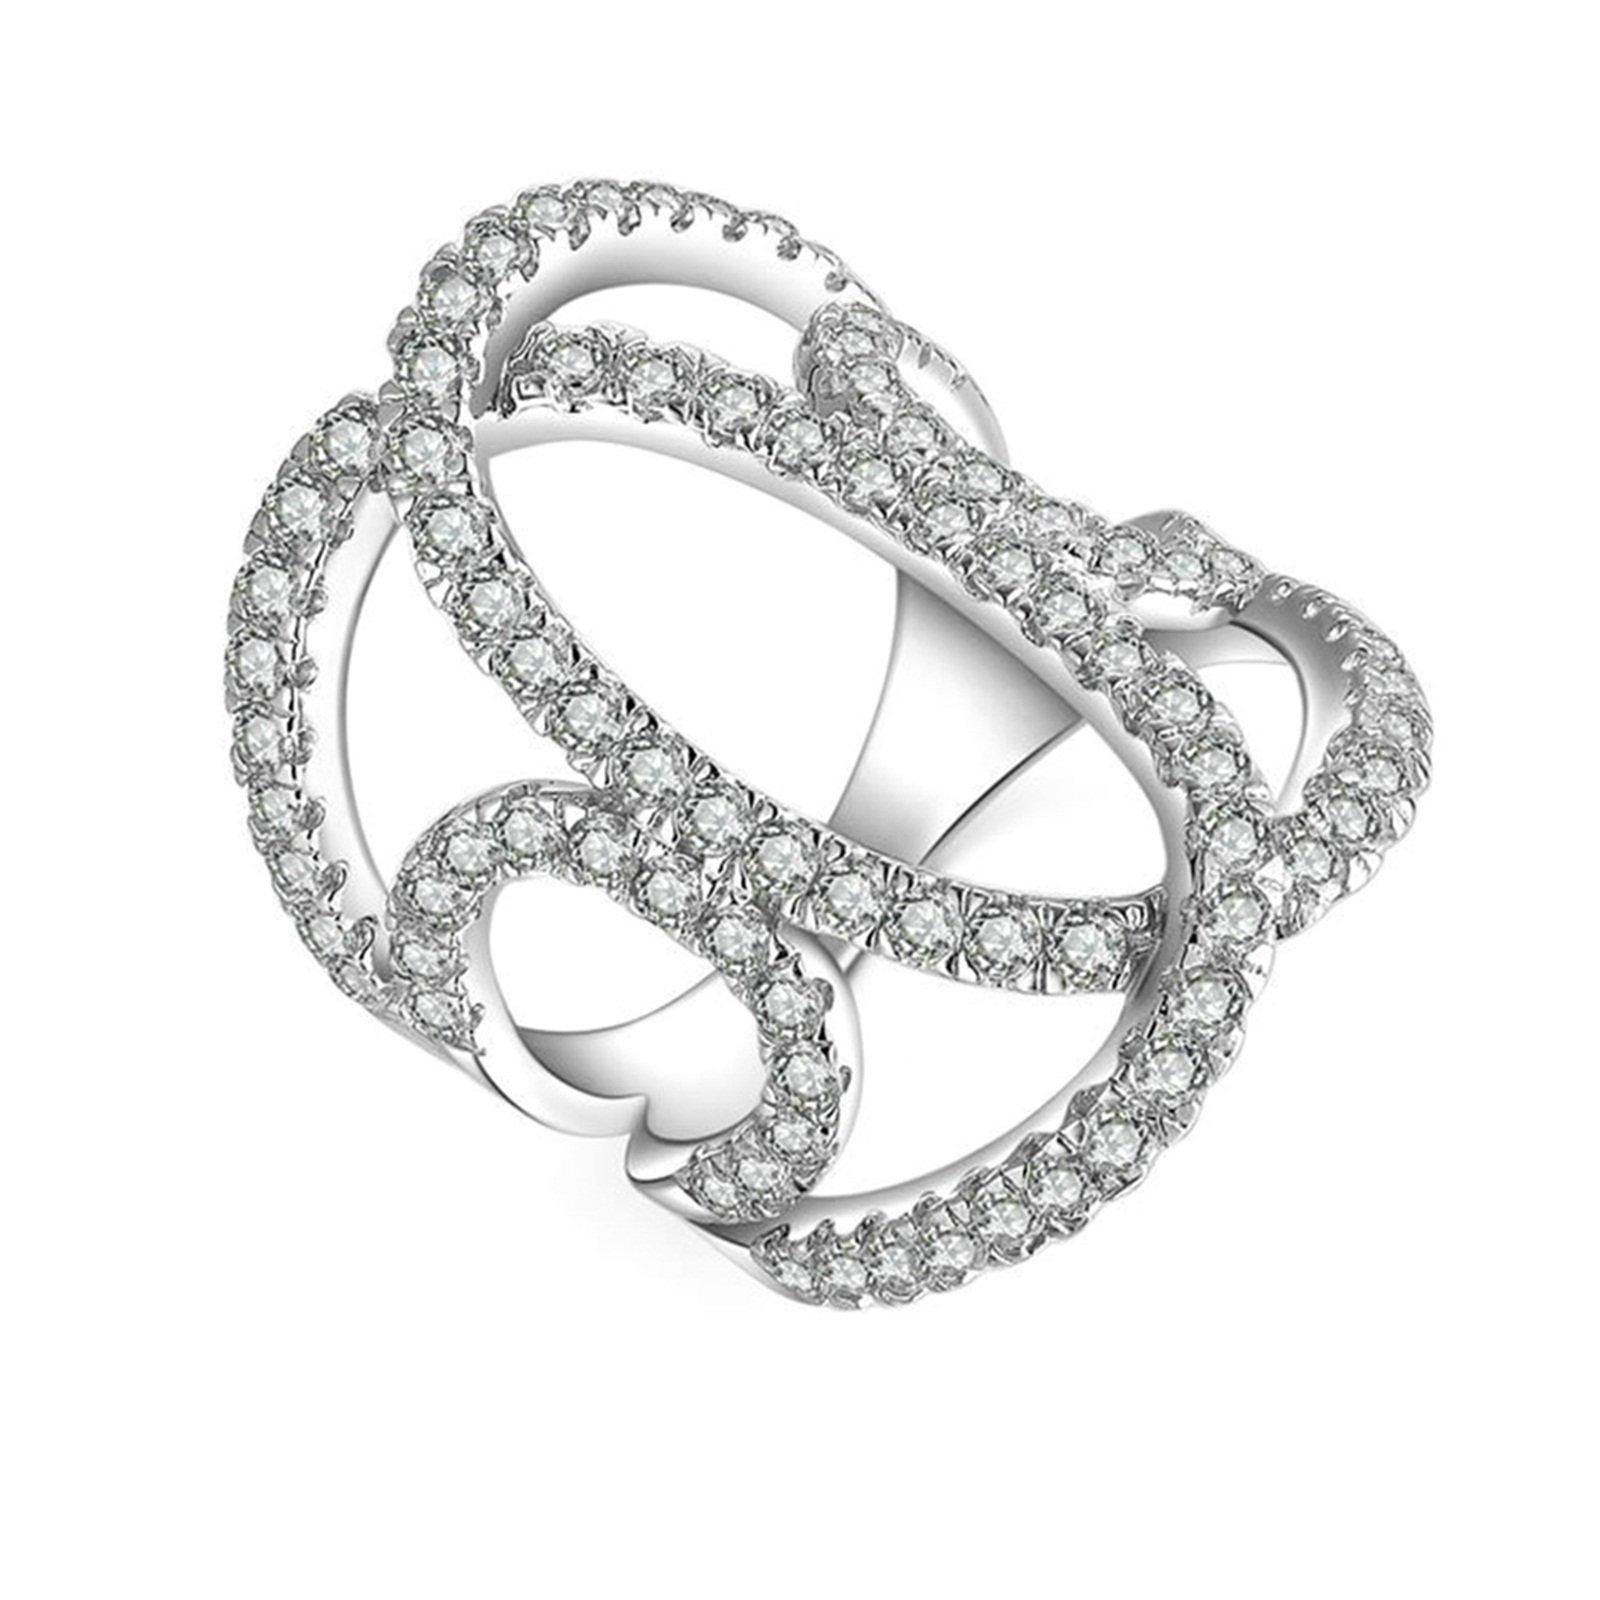 Beydodo Wedding Ring Zirconia Hollow Stackable Ring Round White Cubic Zirconia Size 11 Anniversary Gift